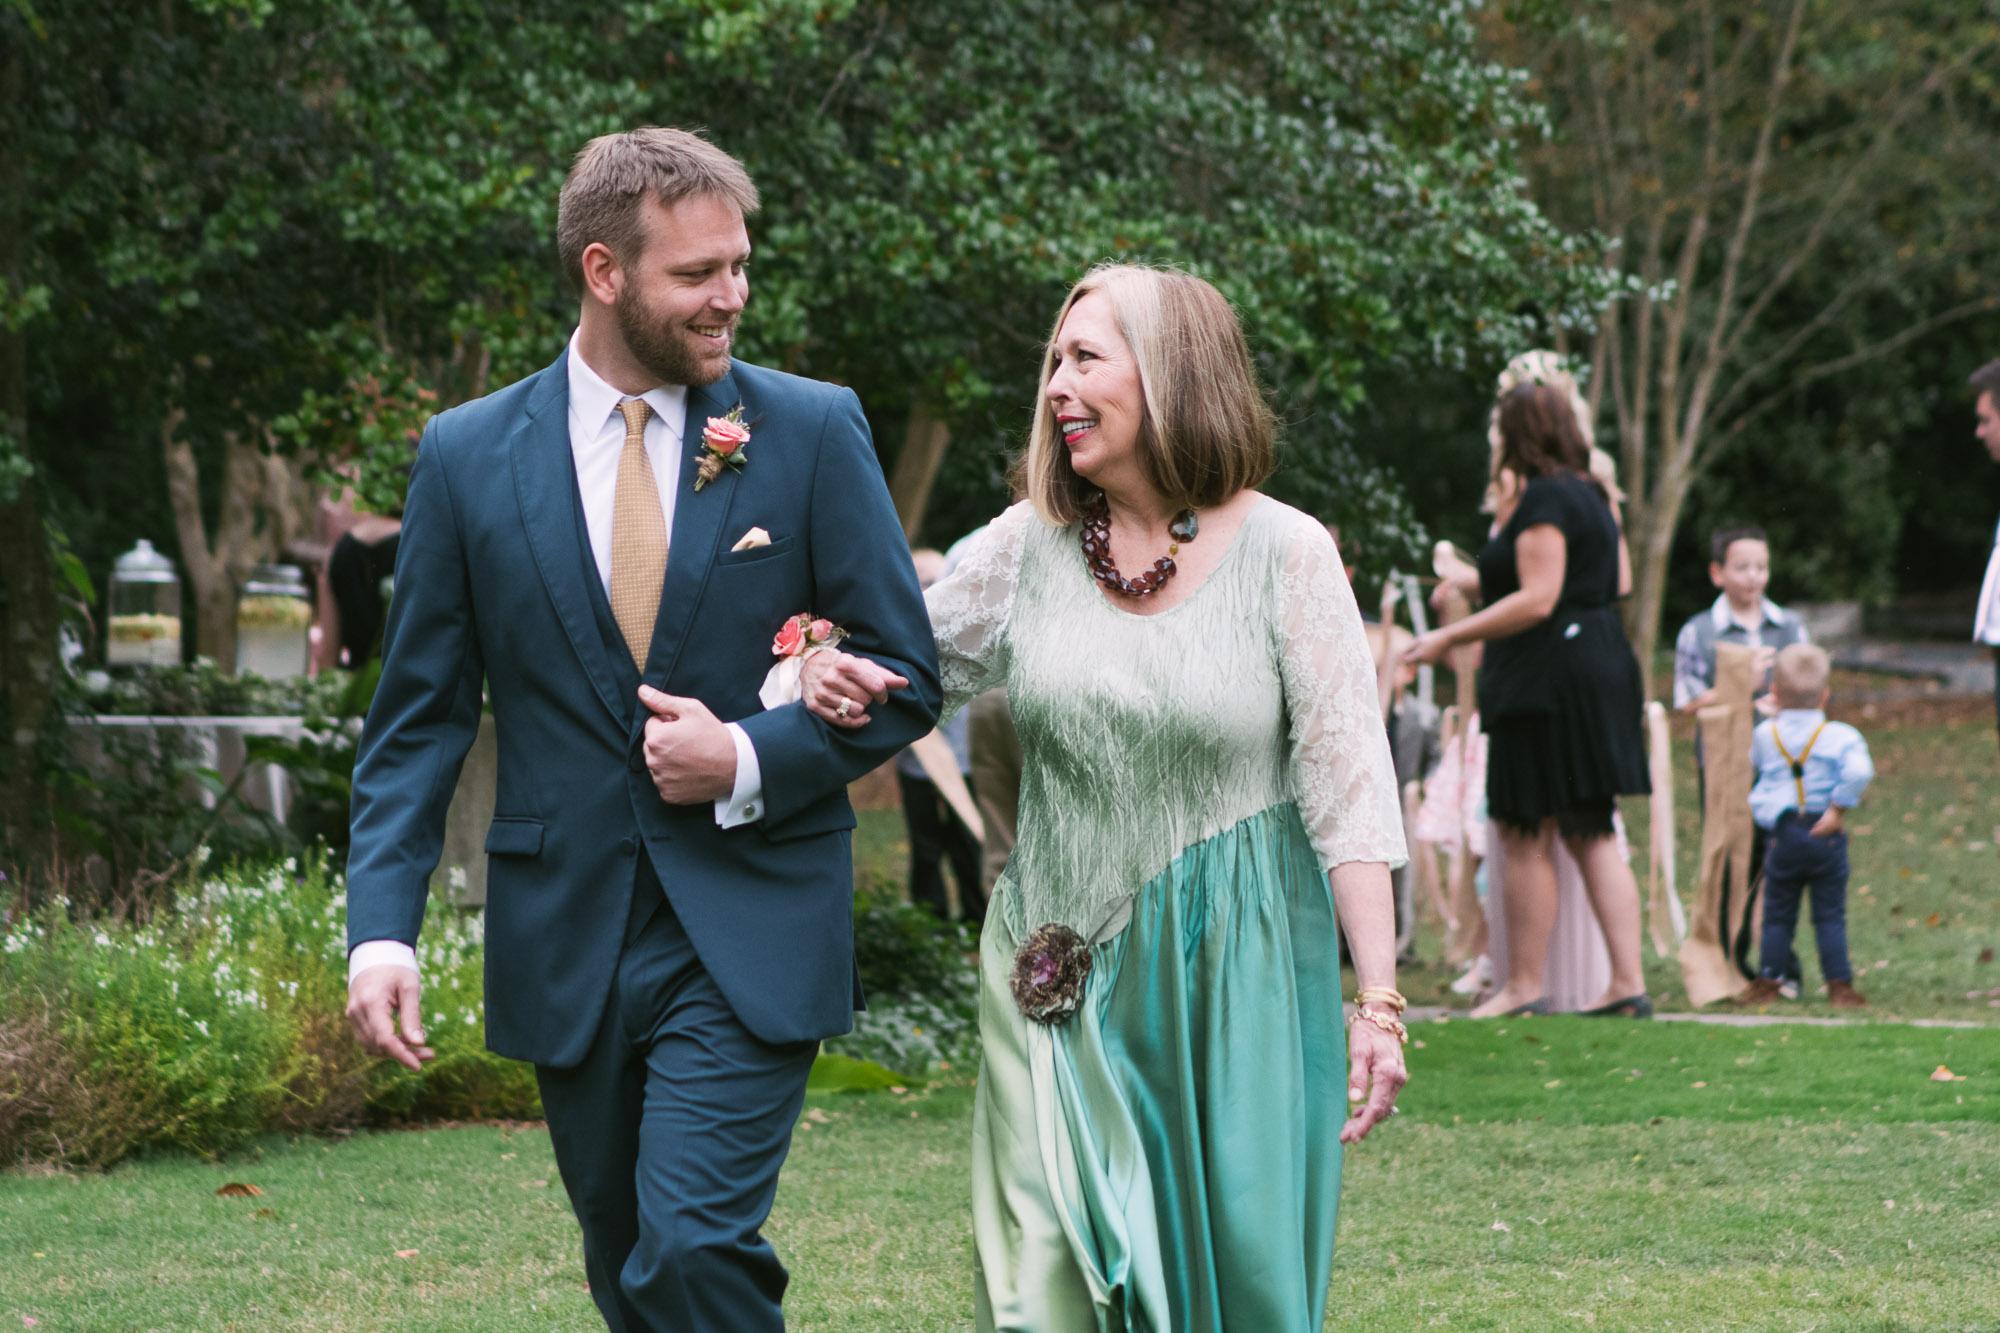 Atlanta; Wedding; Cator Woolford Gardens; Photographer; LeahAndMark & Co.; Outdoor; Fall Wedding; Summer Wedding; Green; Nature; Traditional